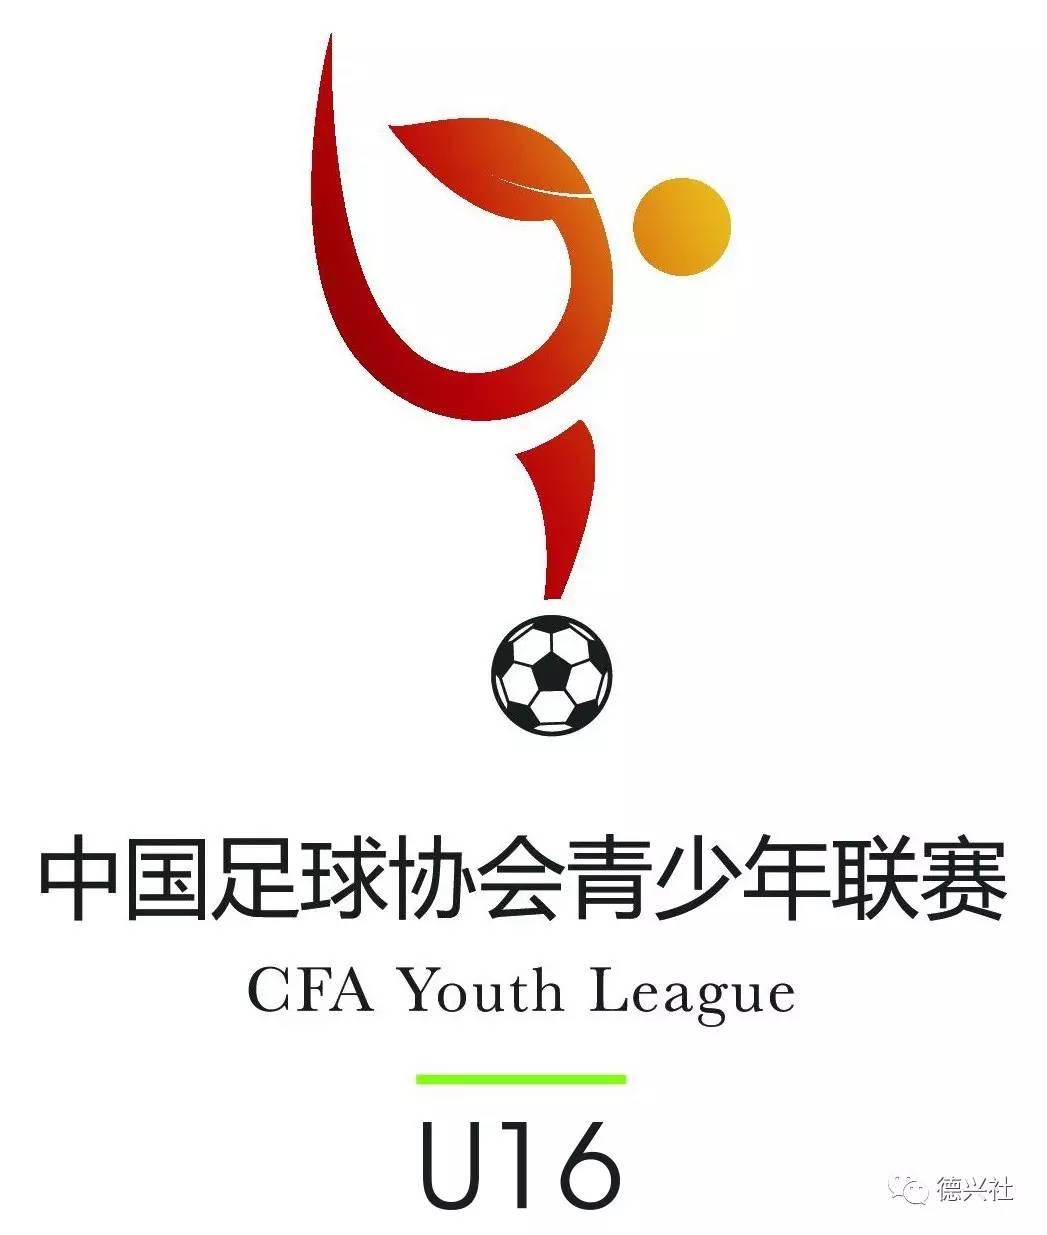 U16联赛第三阶段第二轮●新疆苏宁连胜 恒大鲁能战平